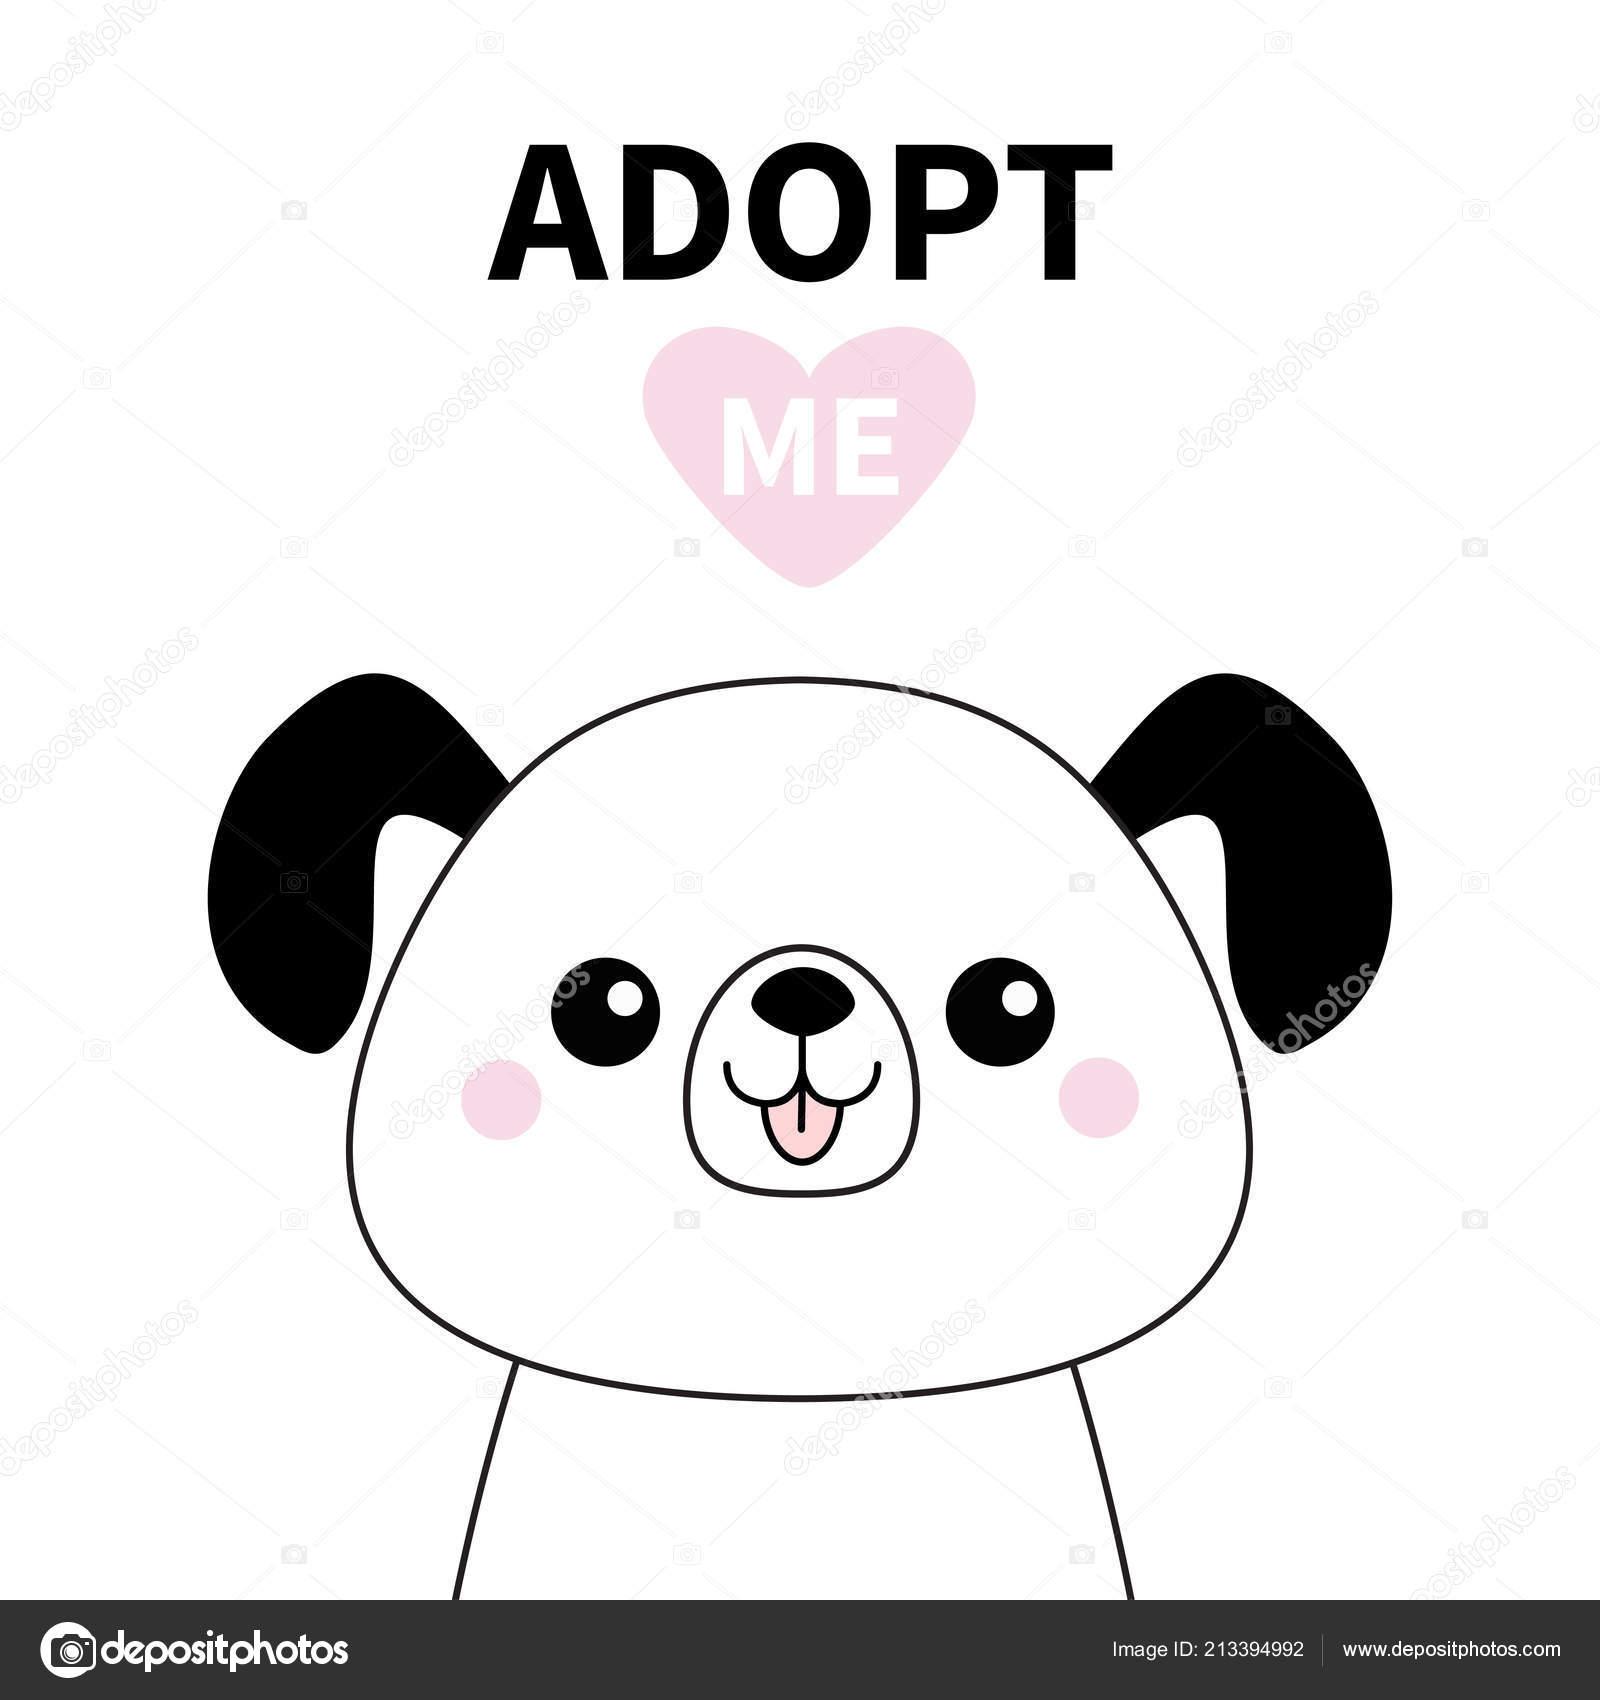 Silhouette Chien Mignon Visage Ligne Adoptez Moi Coeur Rose Adoption